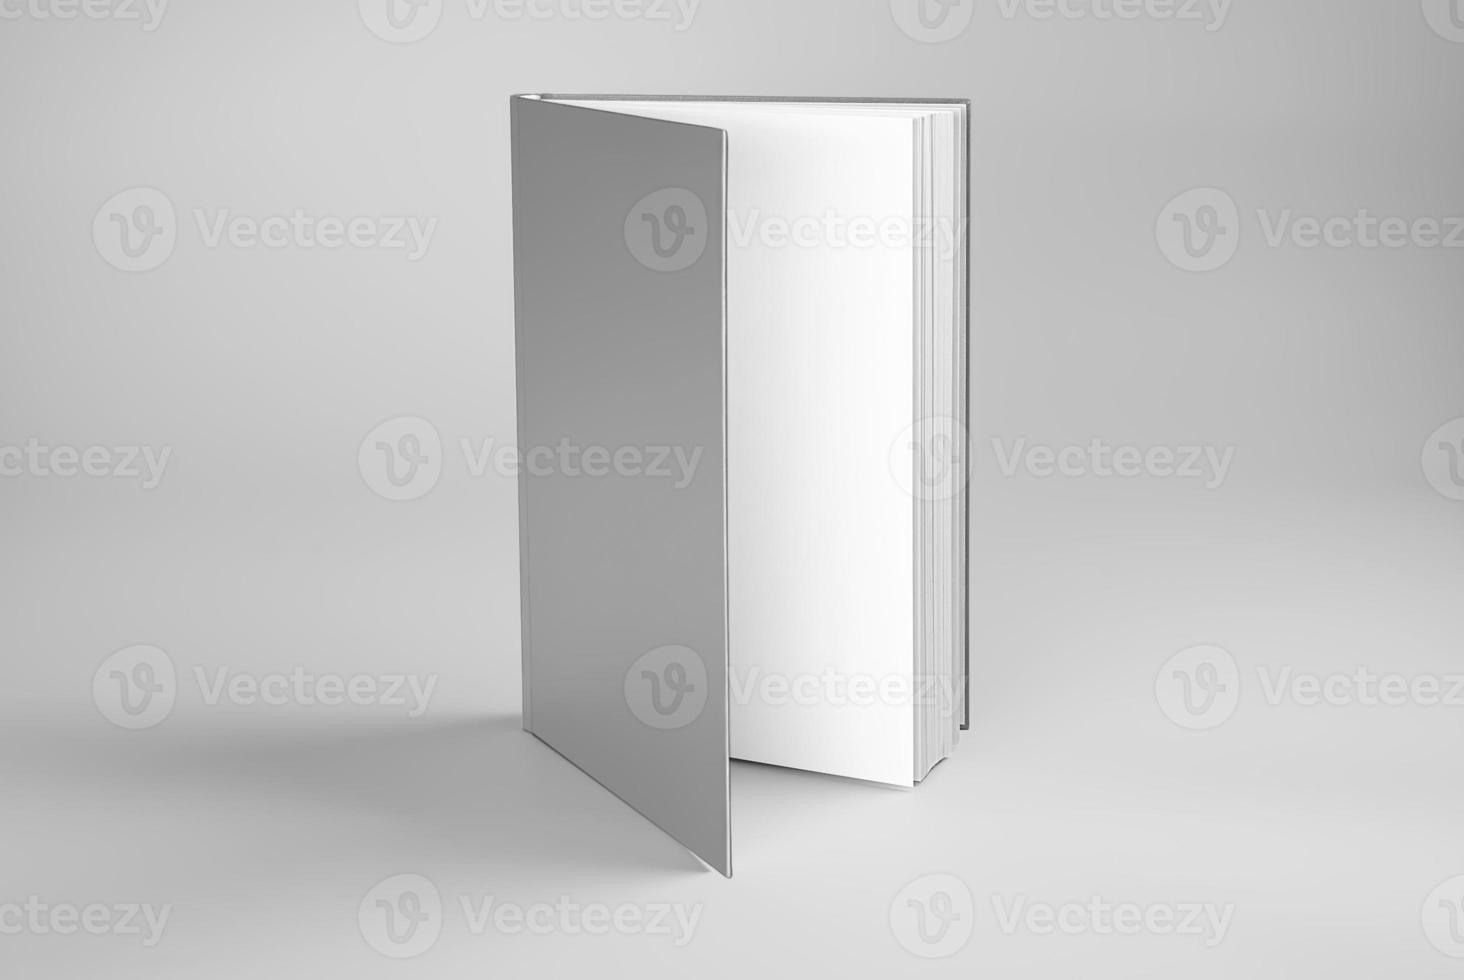 Blank open standing book photo